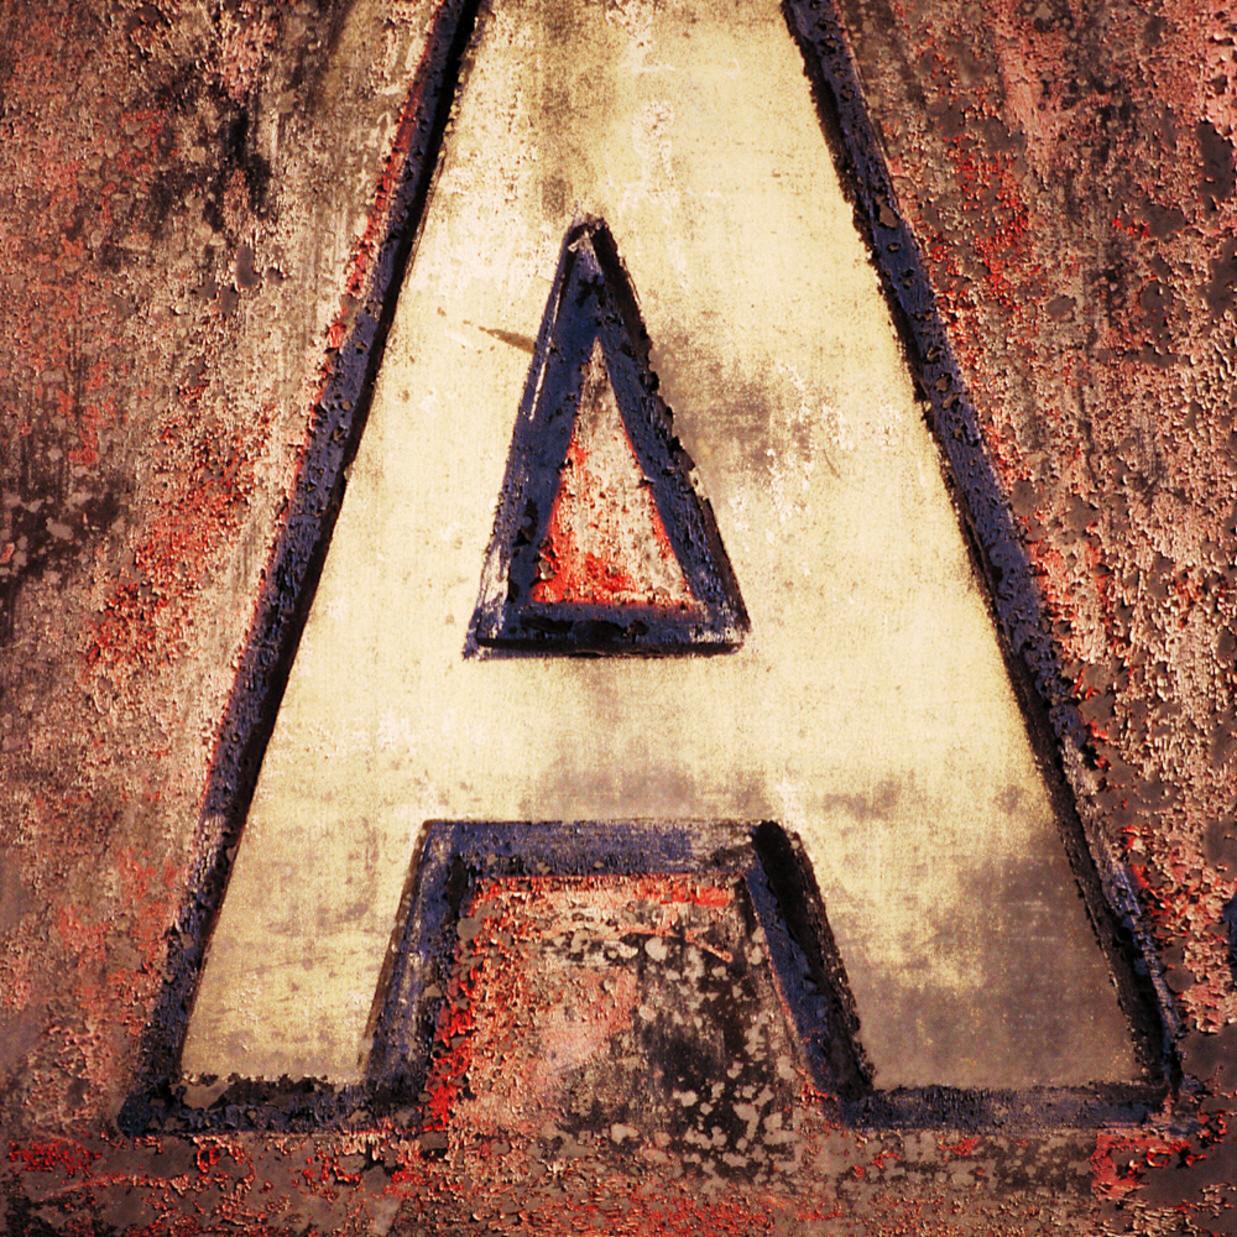 A1 fkboec